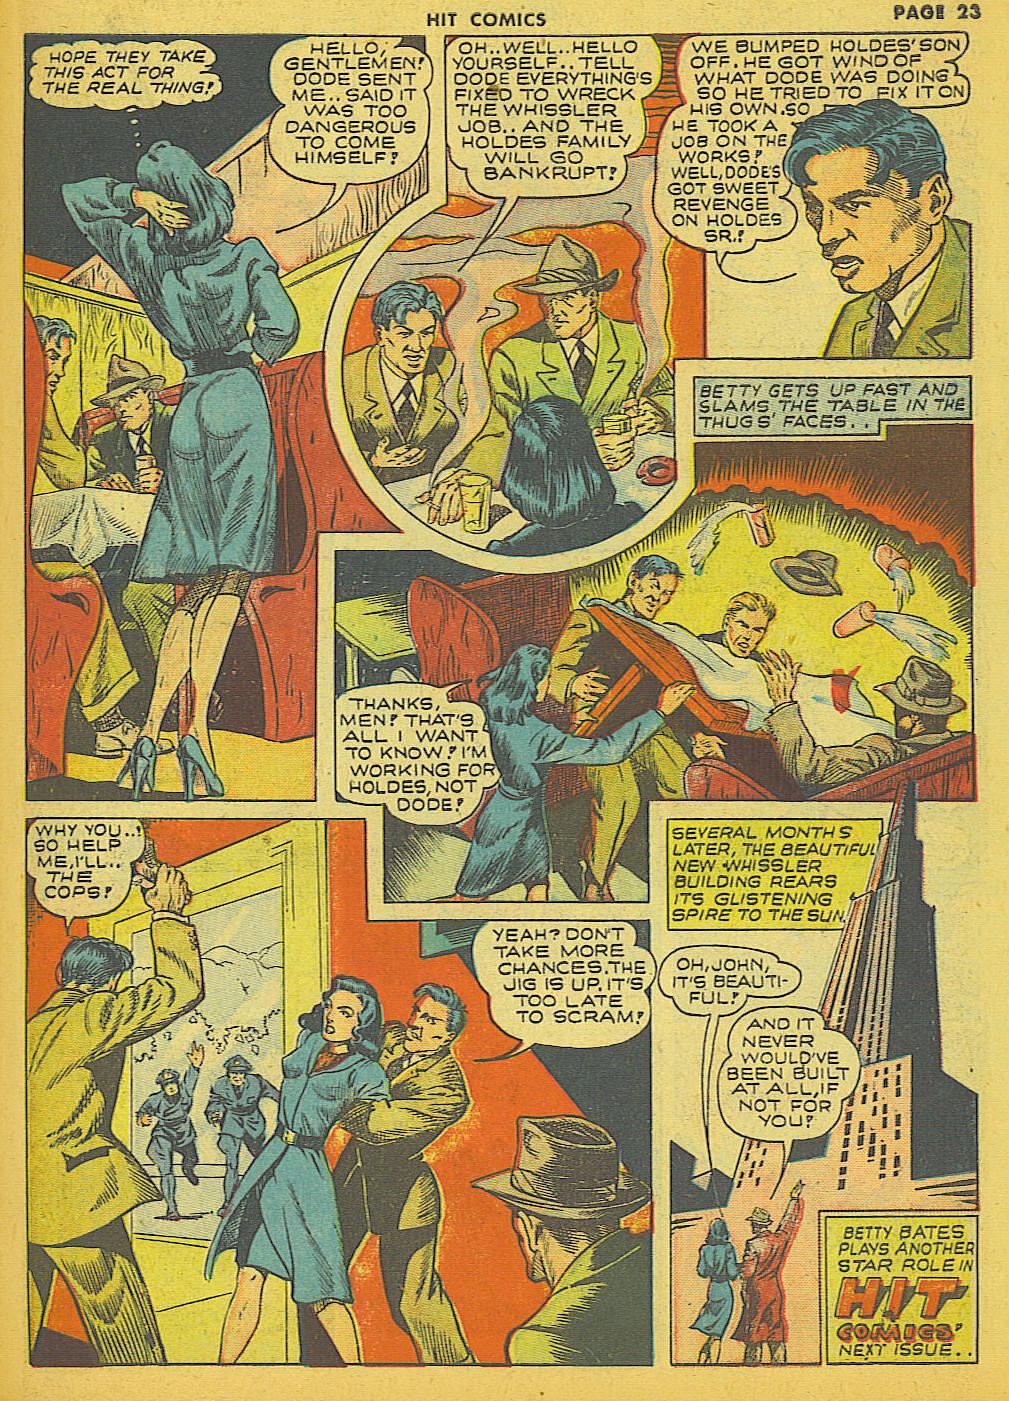 Read online Hit Comics comic -  Issue #21 - 25